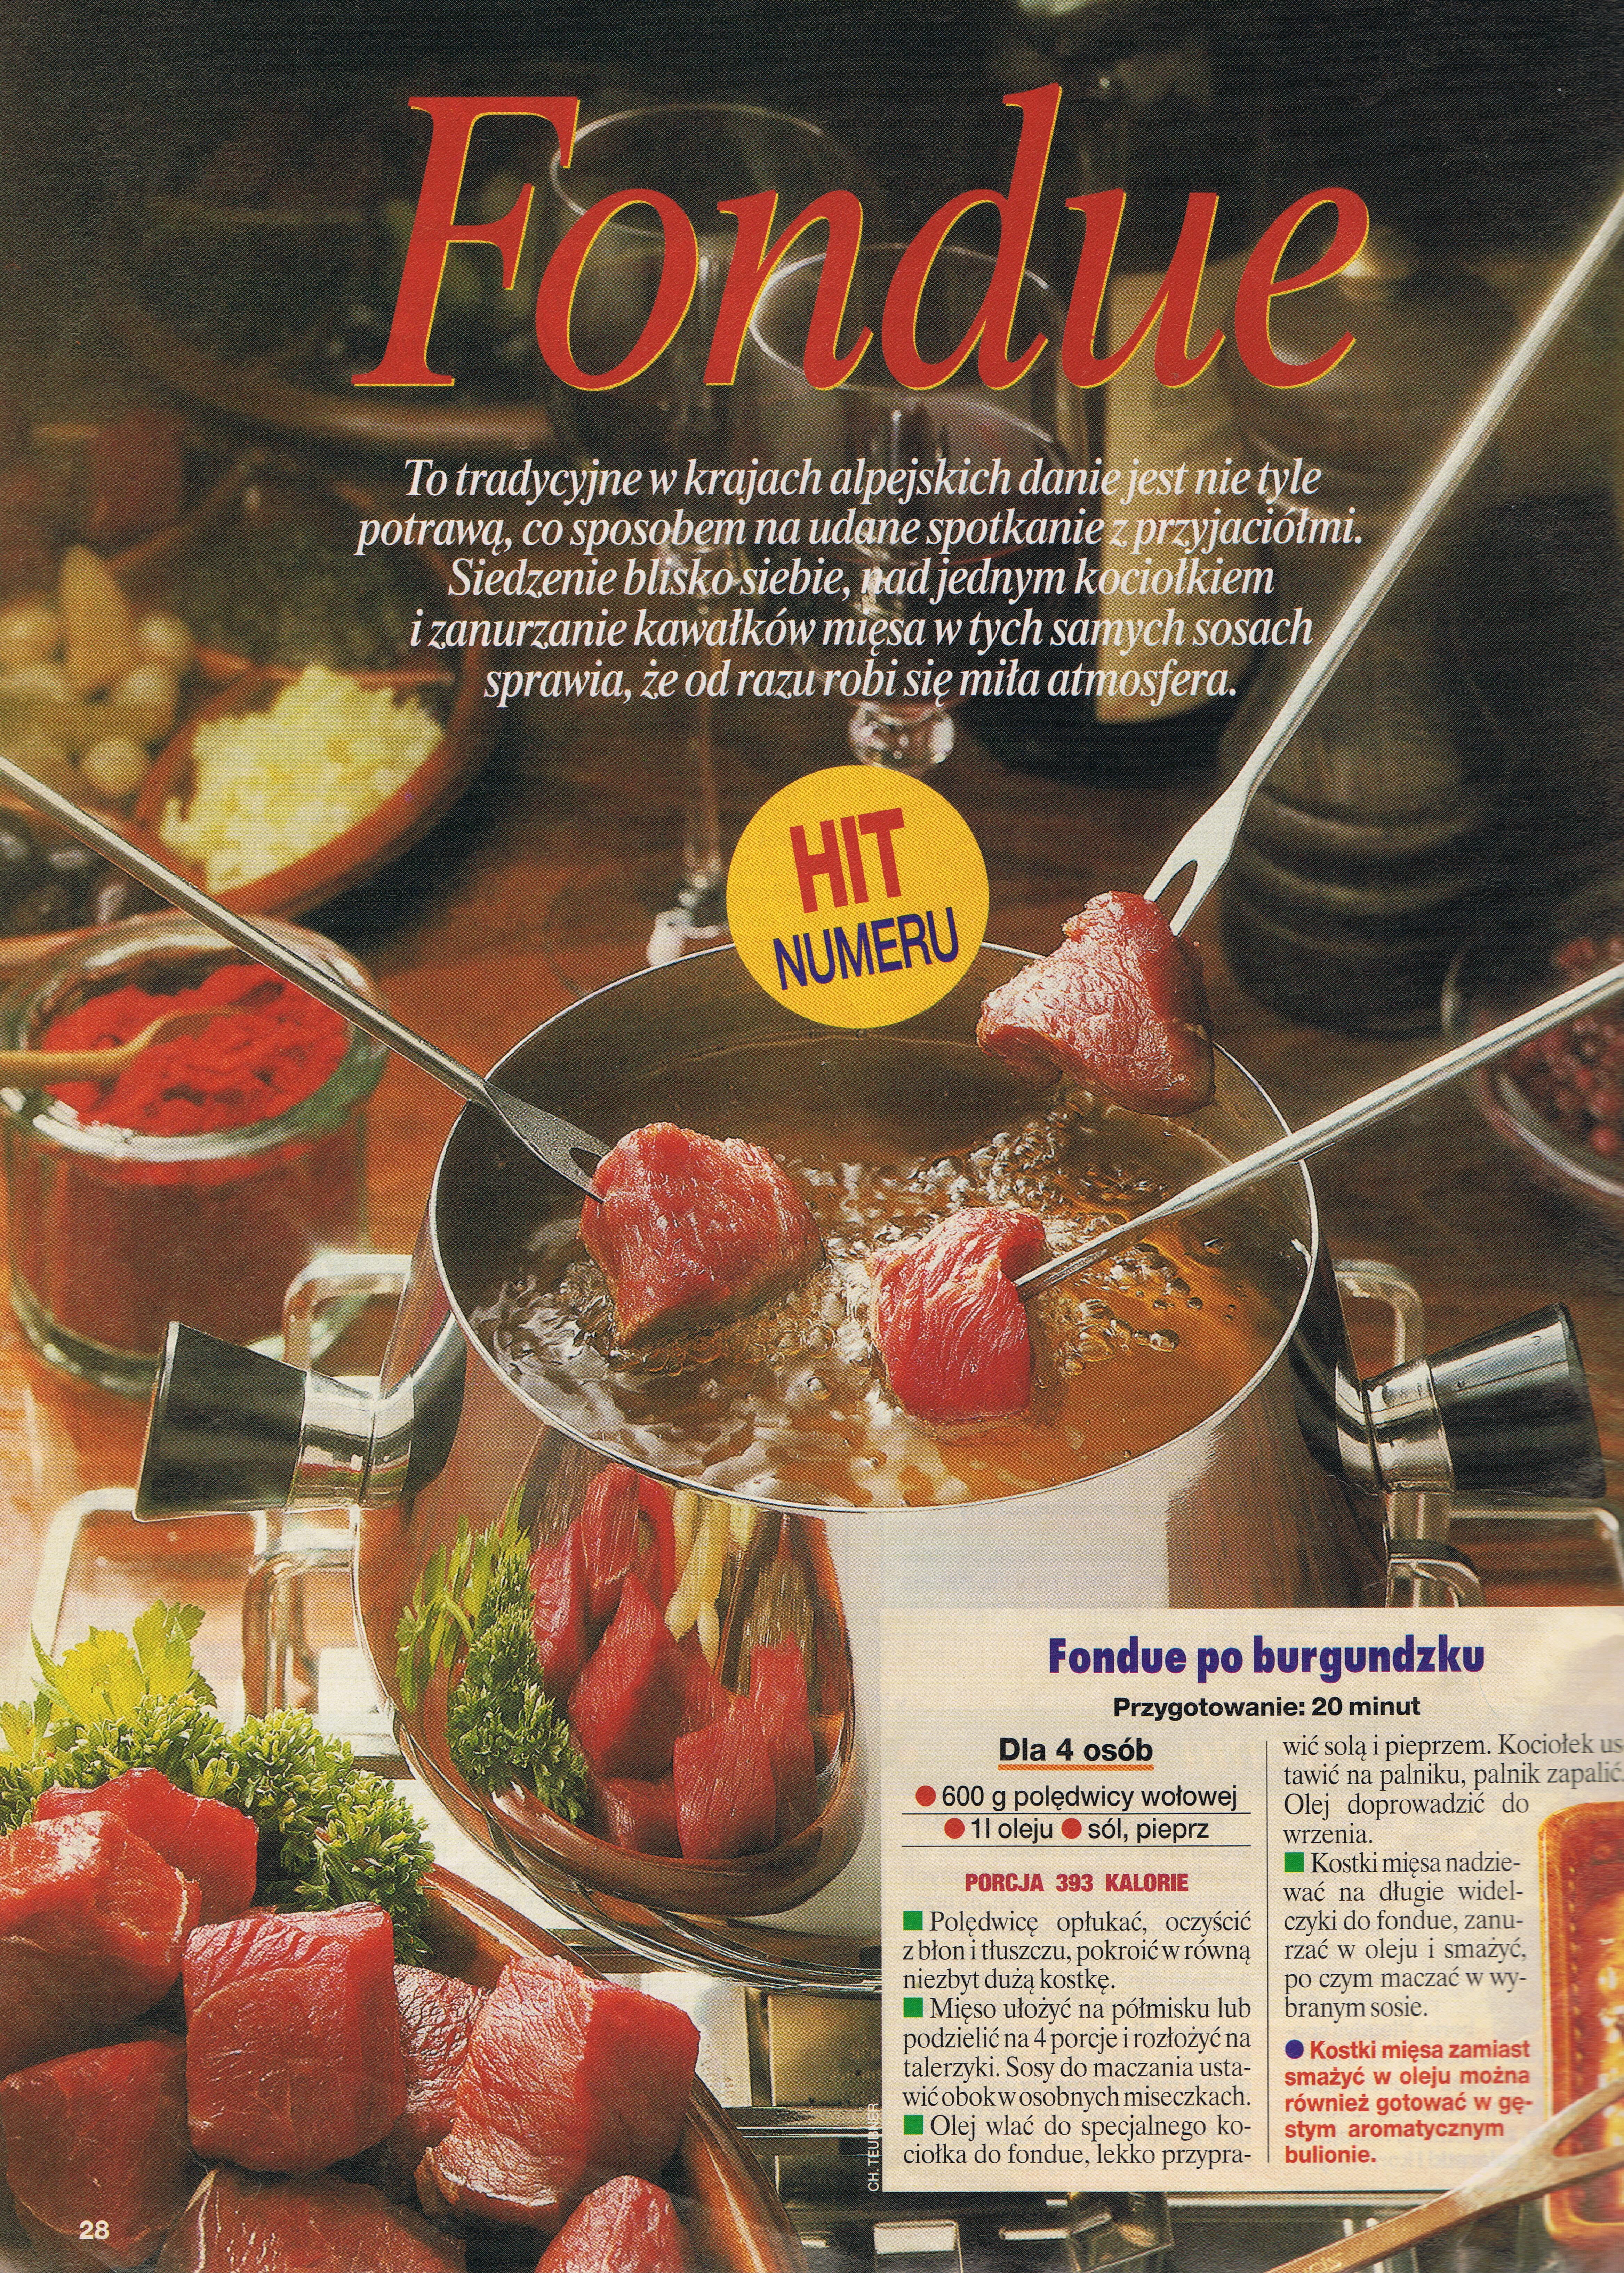 fondue_burg1